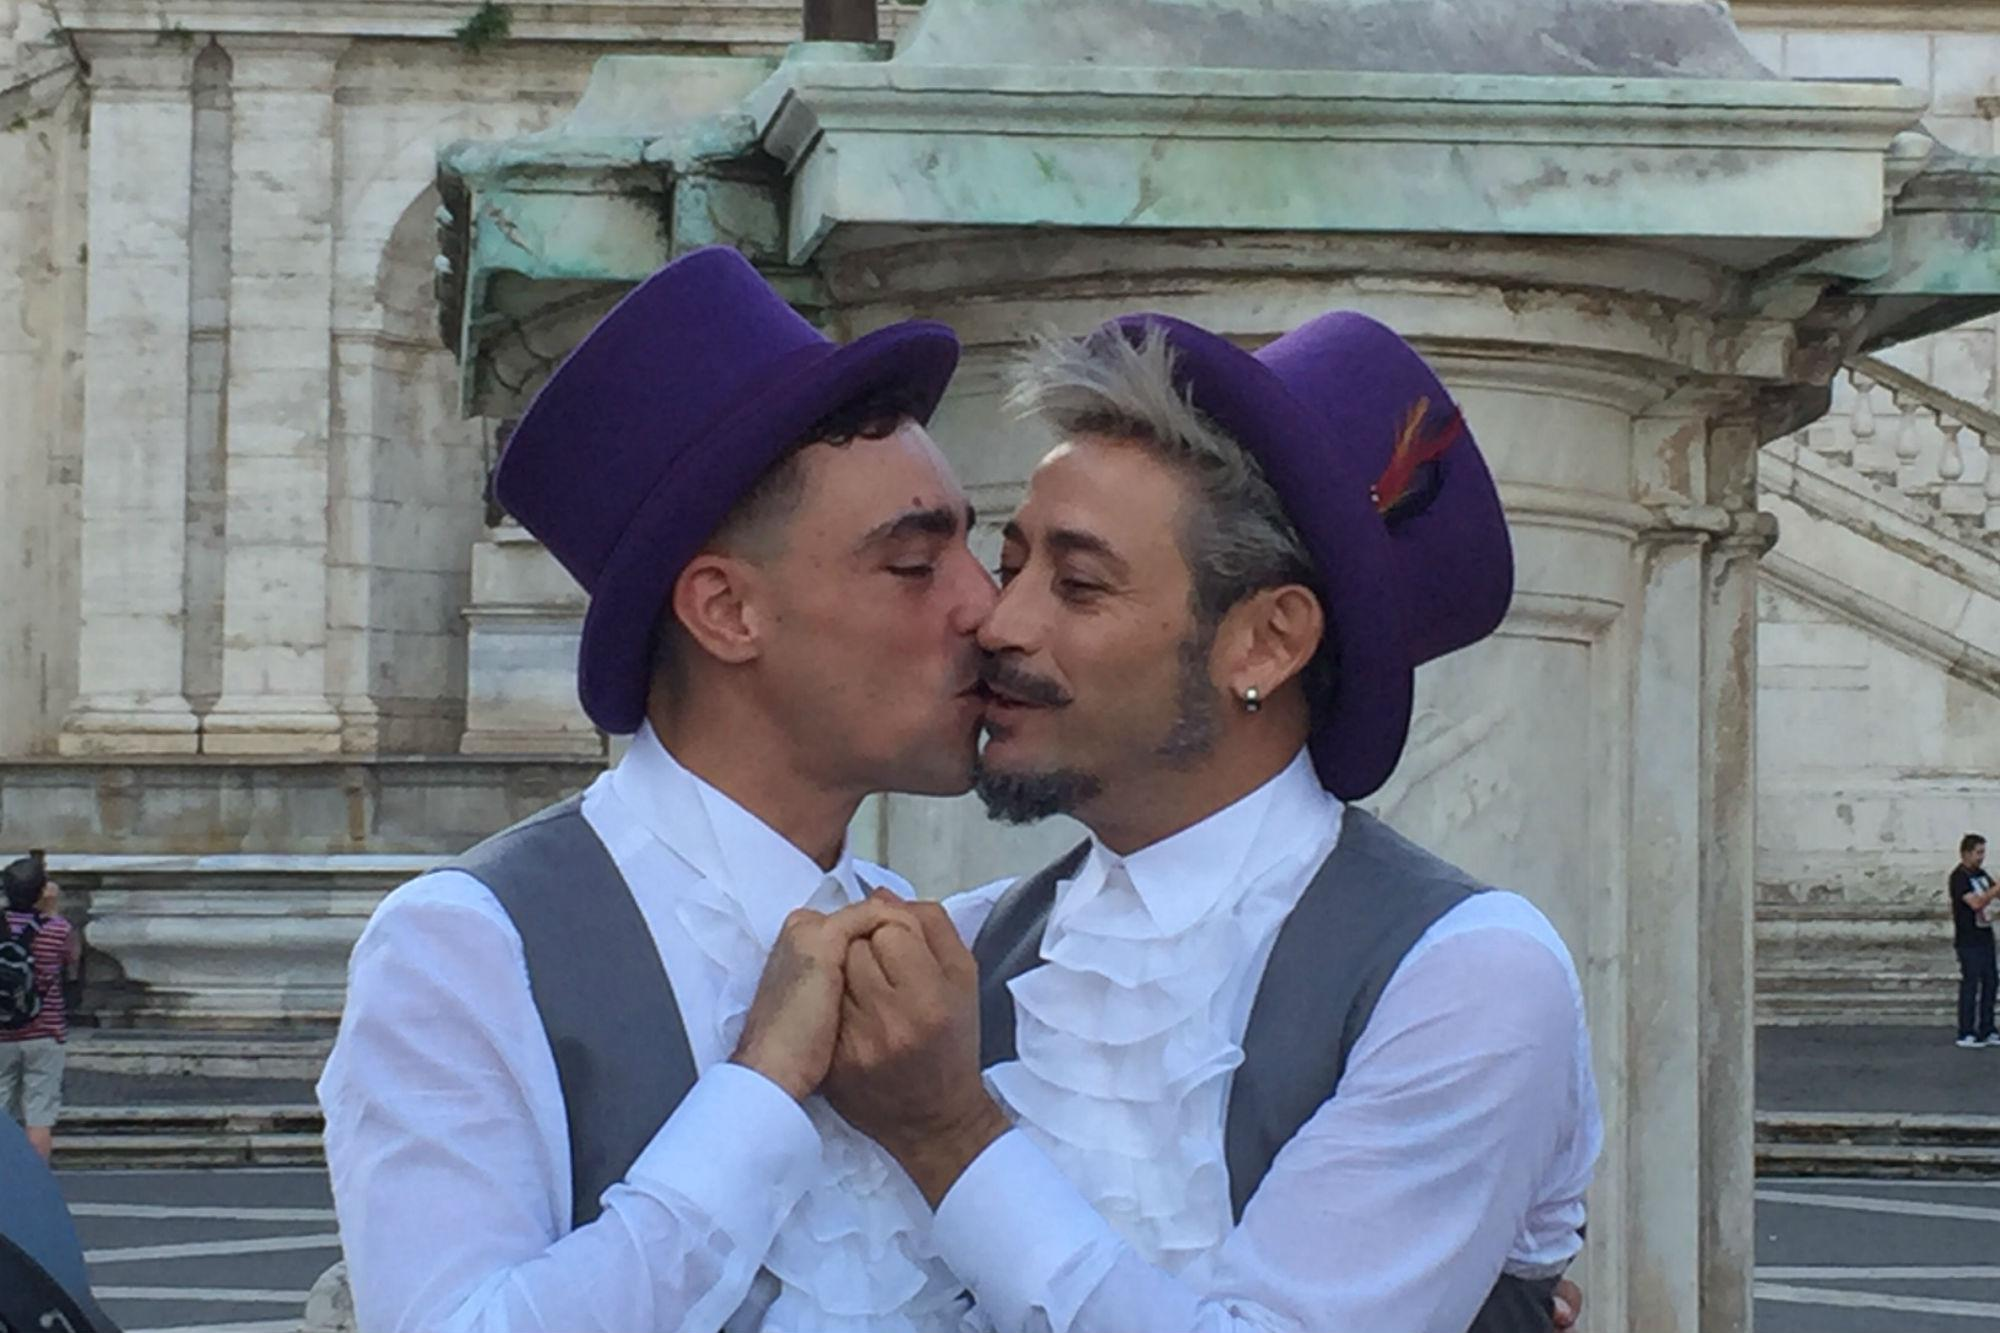 gay escort napoli cerco gay torino